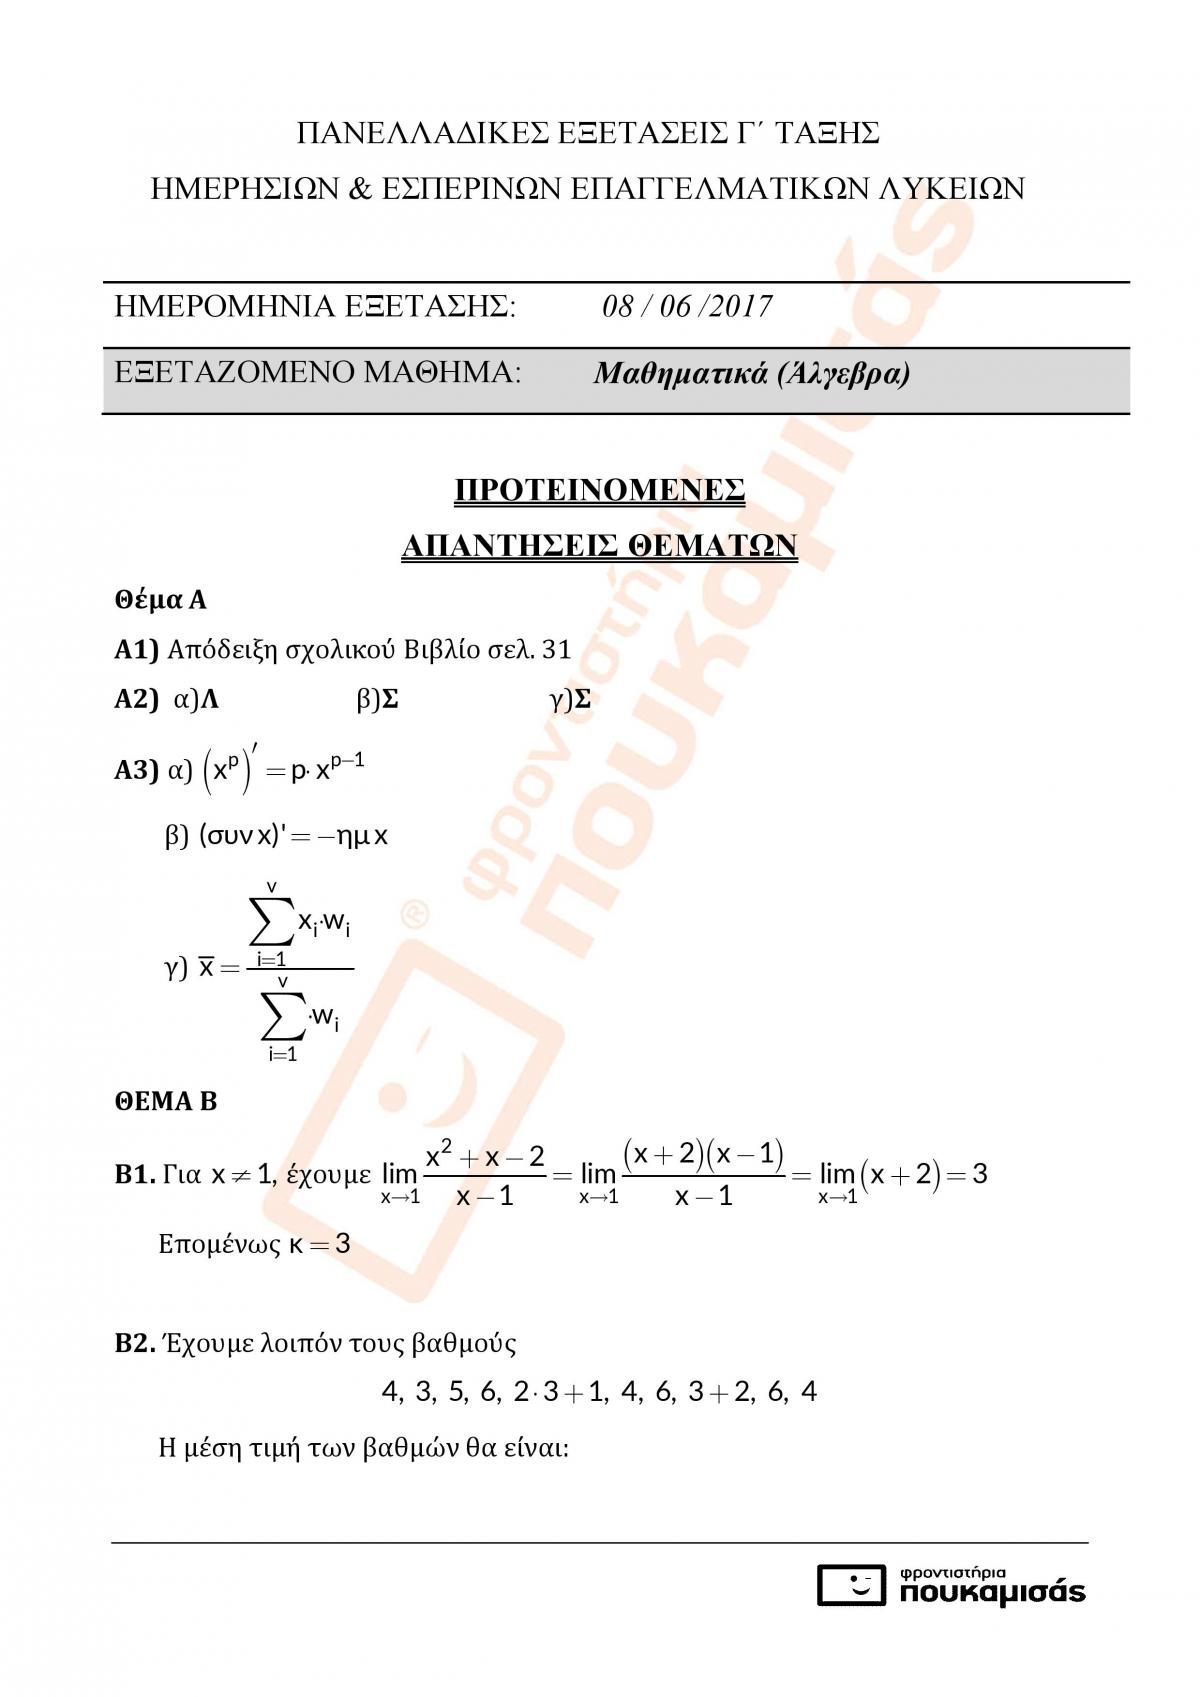 2aa7fc7579b0 Πανελλήνιες 2017  ΤΕΛΙΚΕΣ απαντήσεις στα θέματα στα Μαθηματικά ΕΠΑΛ ...